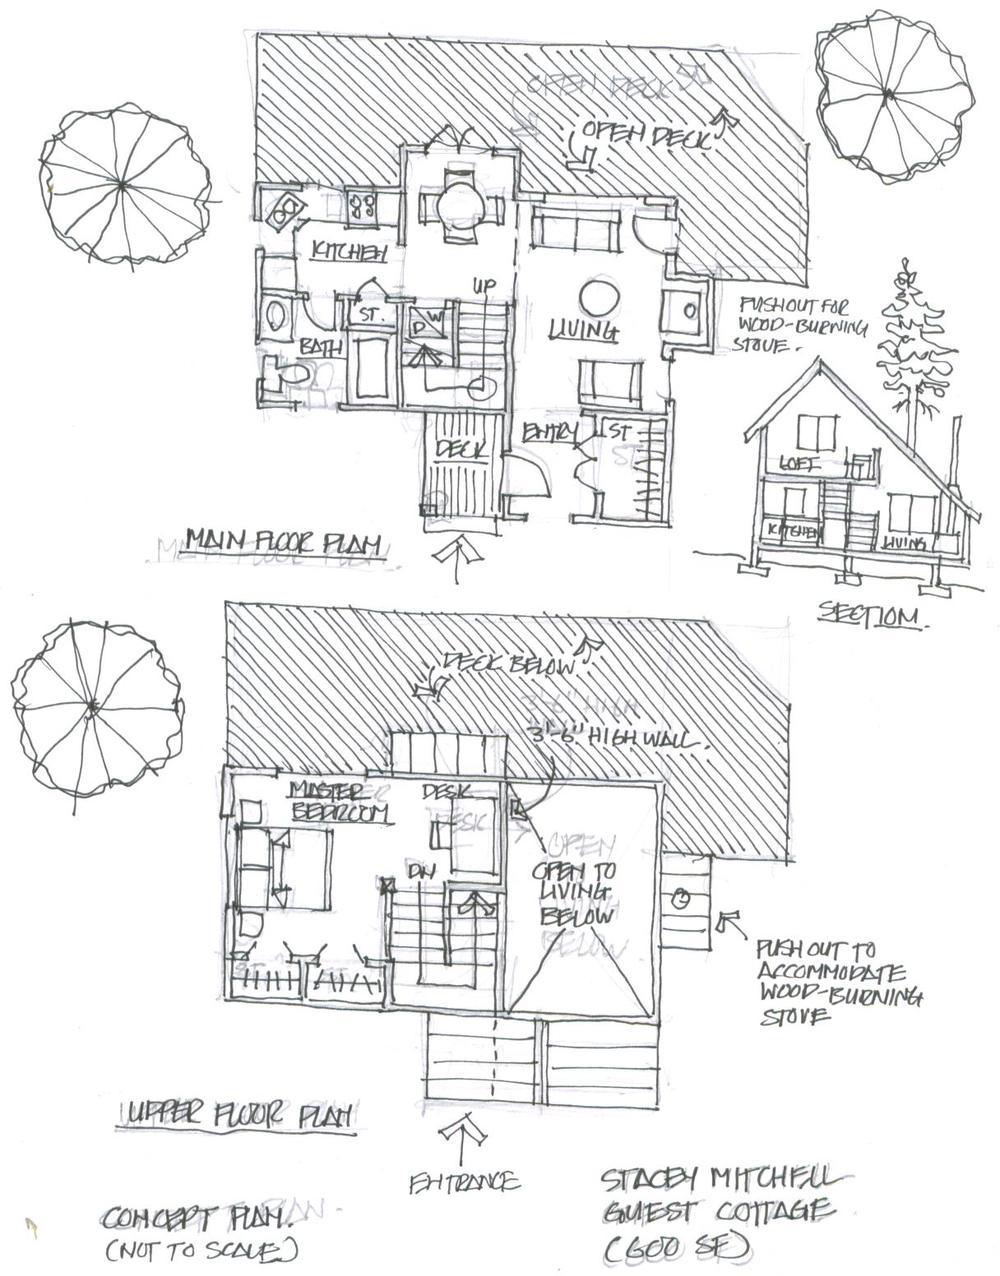 mitchell concept plans.jpg